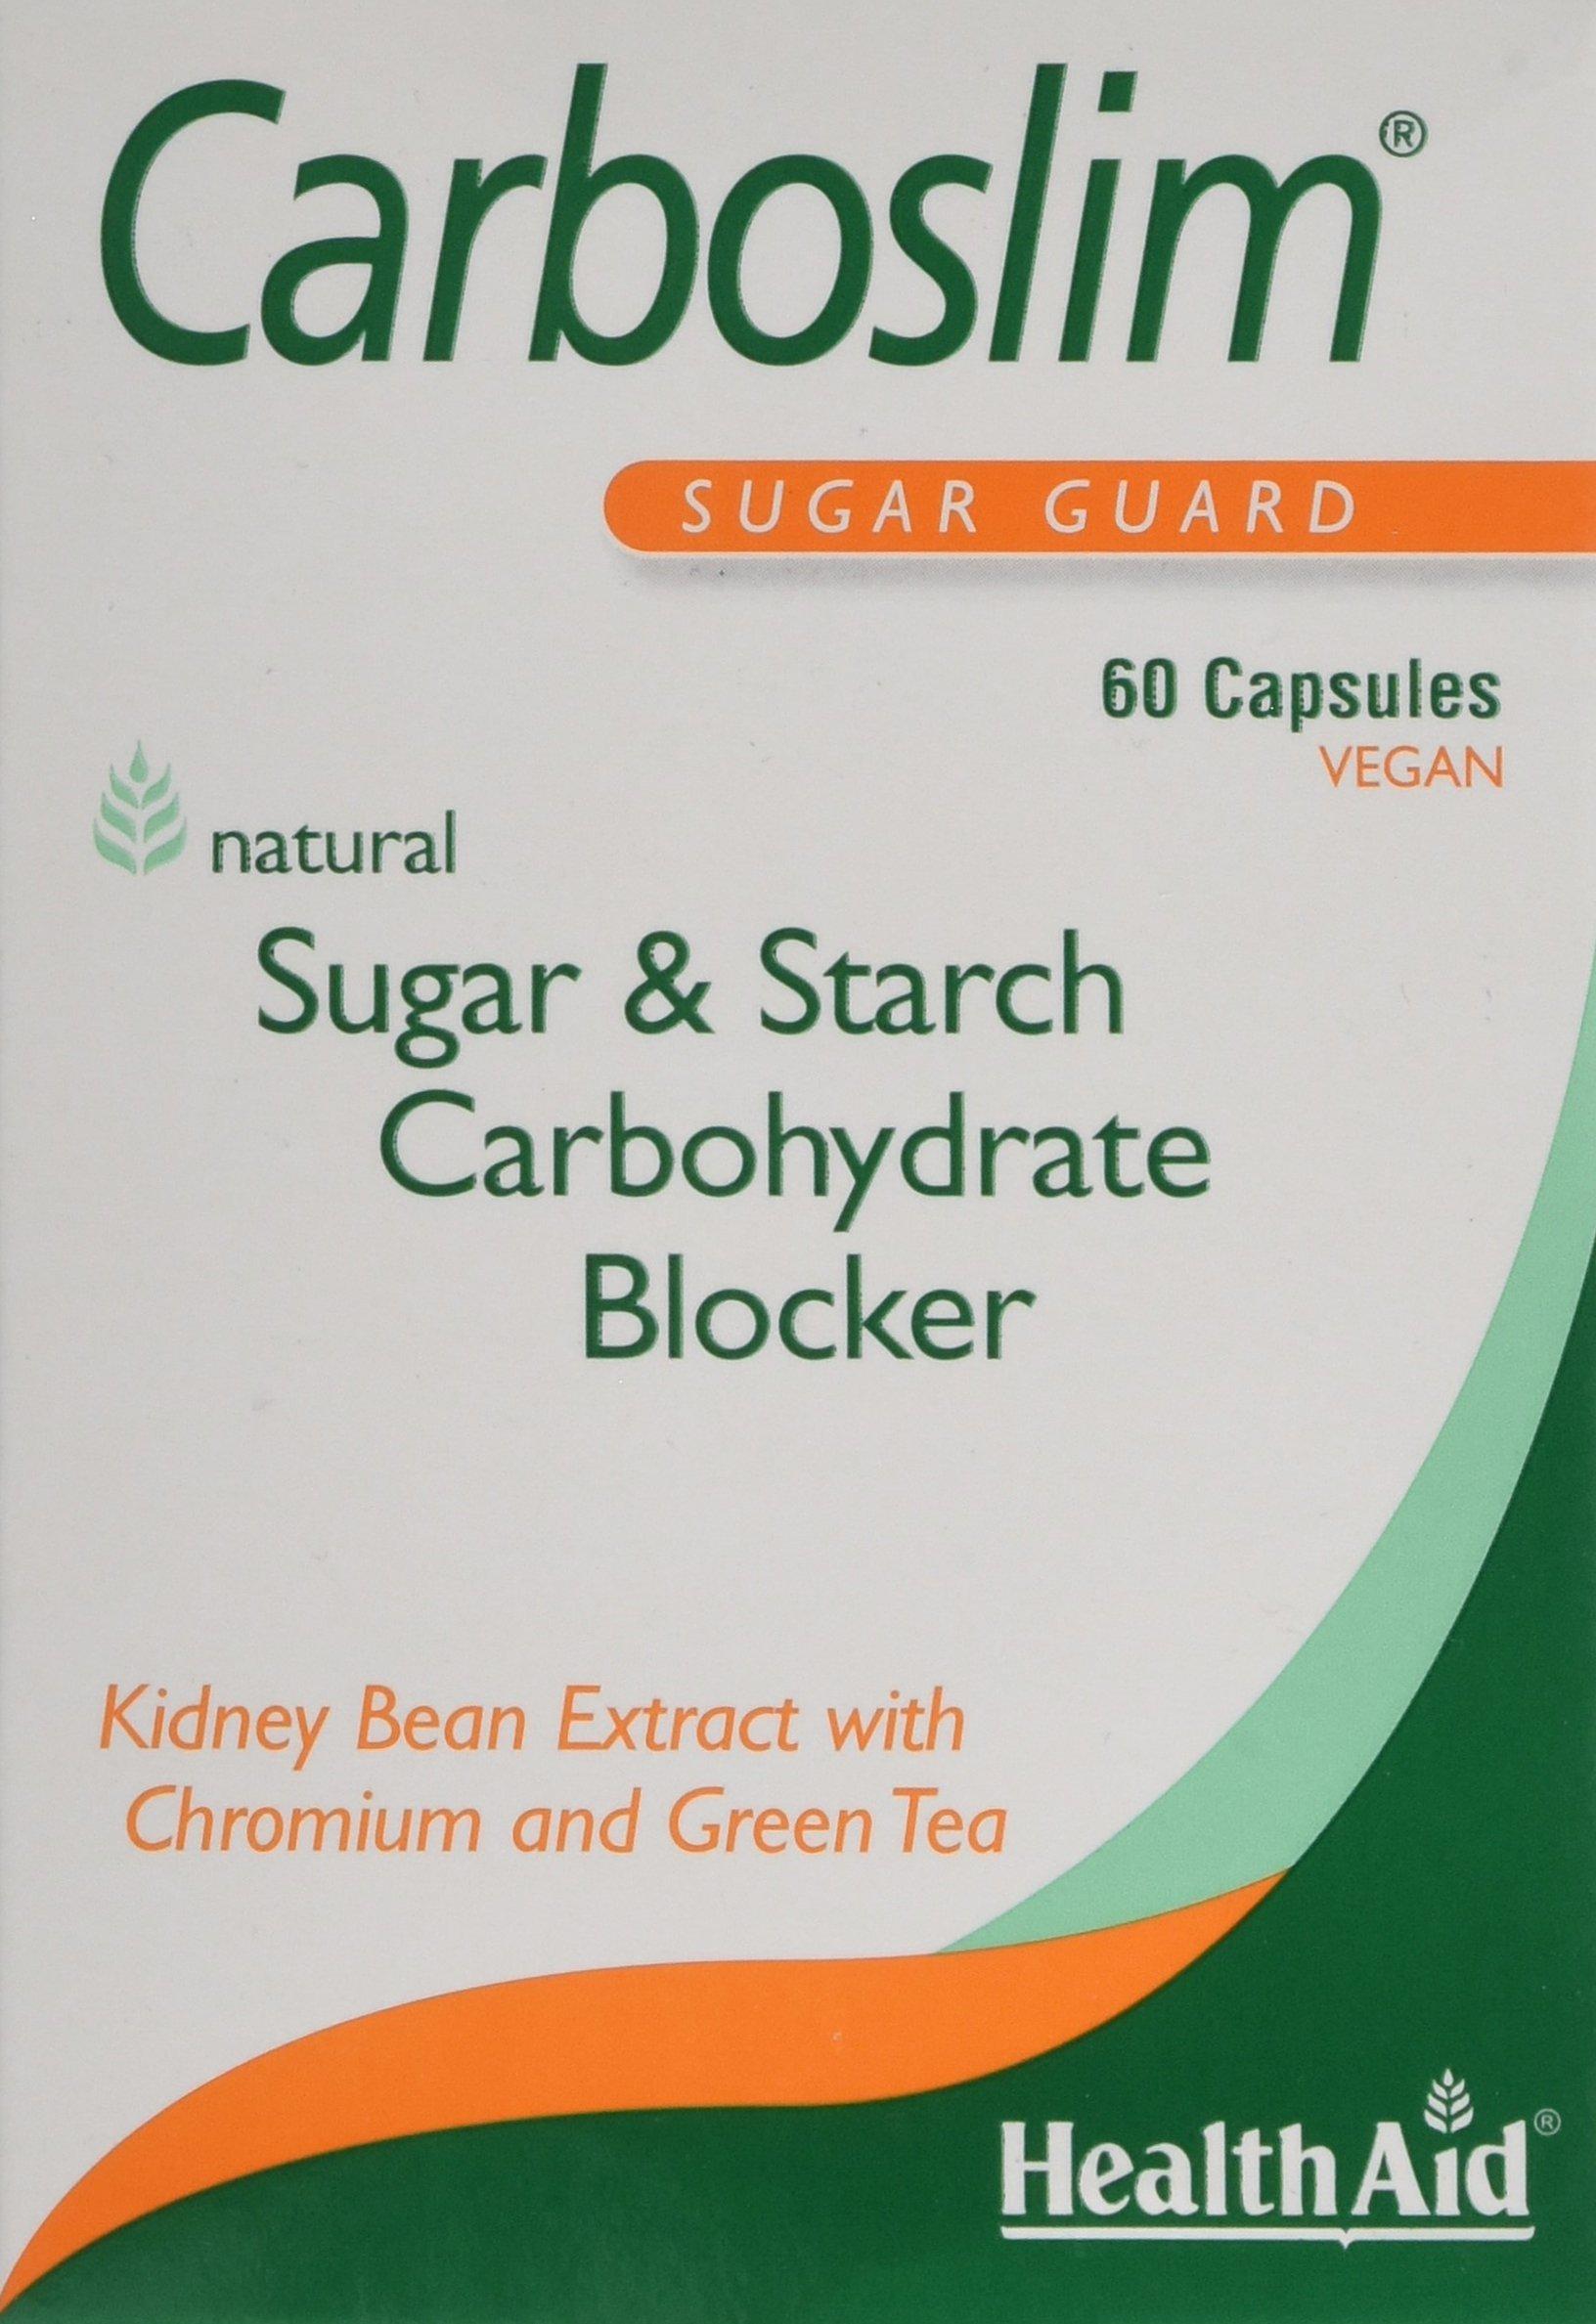 81ismHnuNWL - HealthAid Carboslim - Kidney Bean Extract - 60 Vegan Capsules